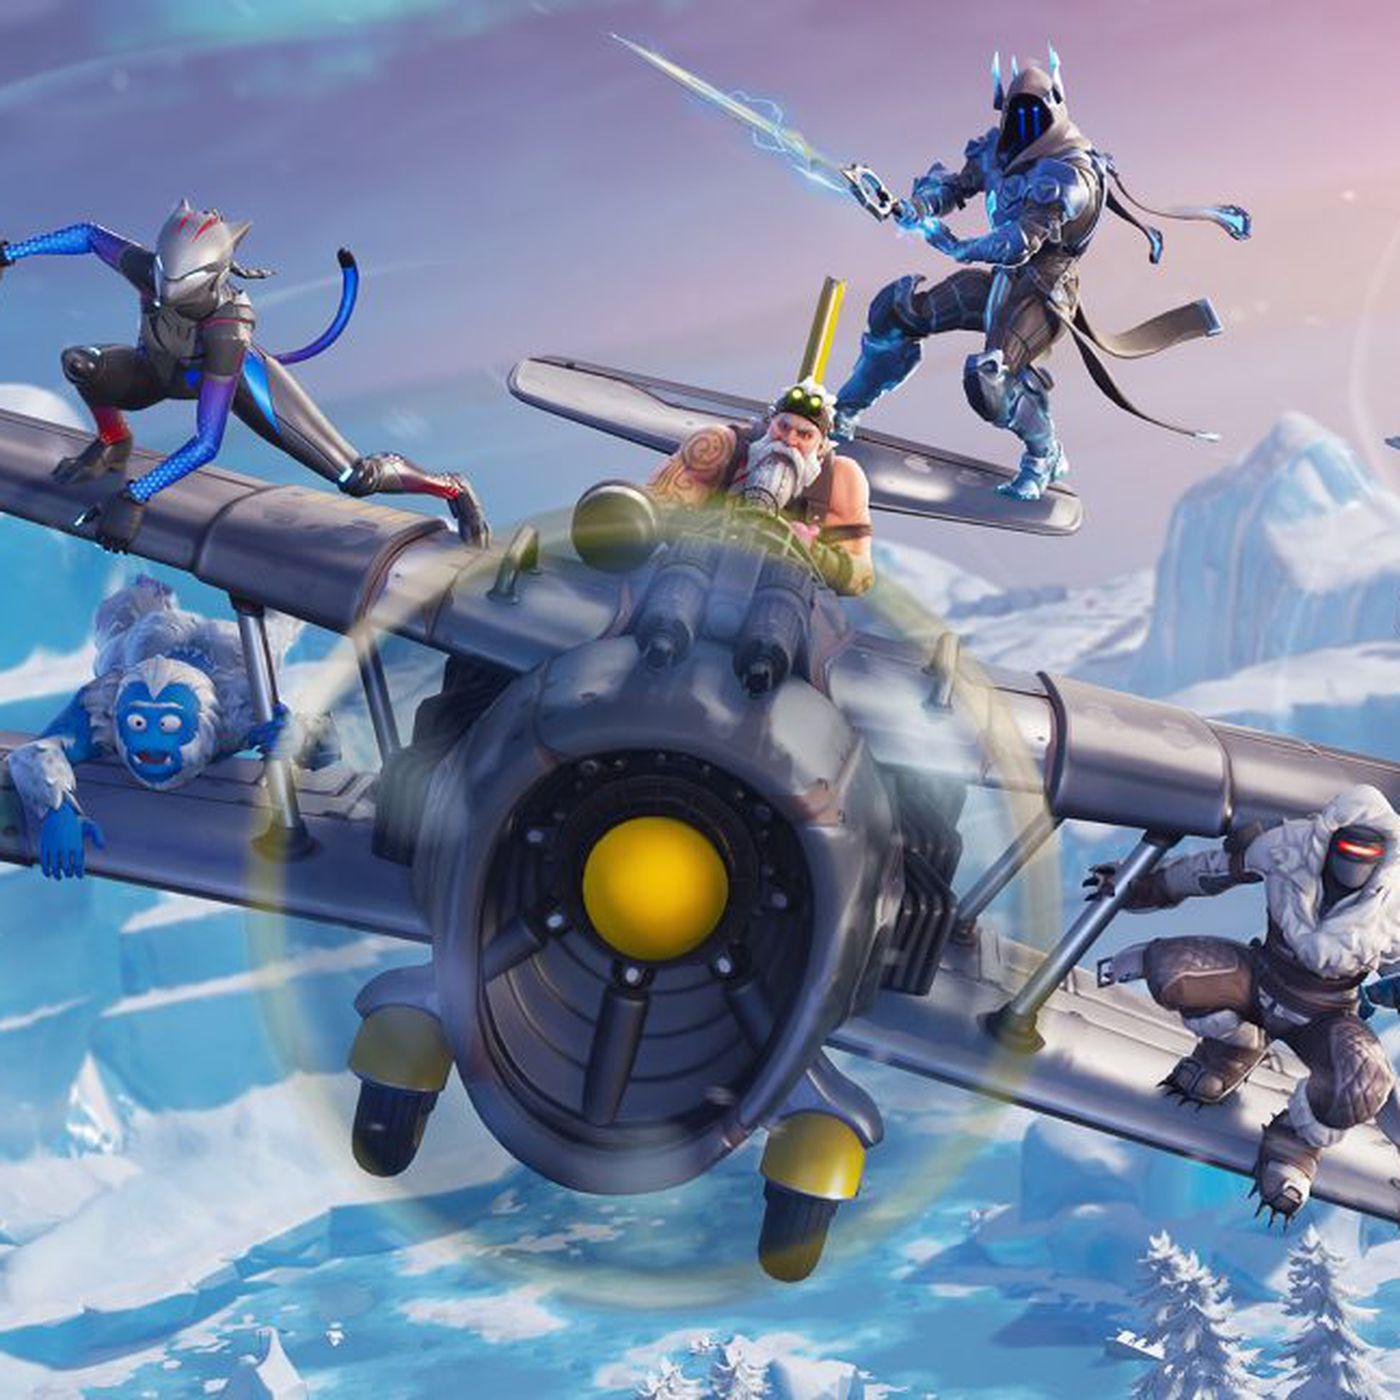 fortnite season 7 arrives with santa planes and lots of snow the verge - fortnite season 7 santa skin